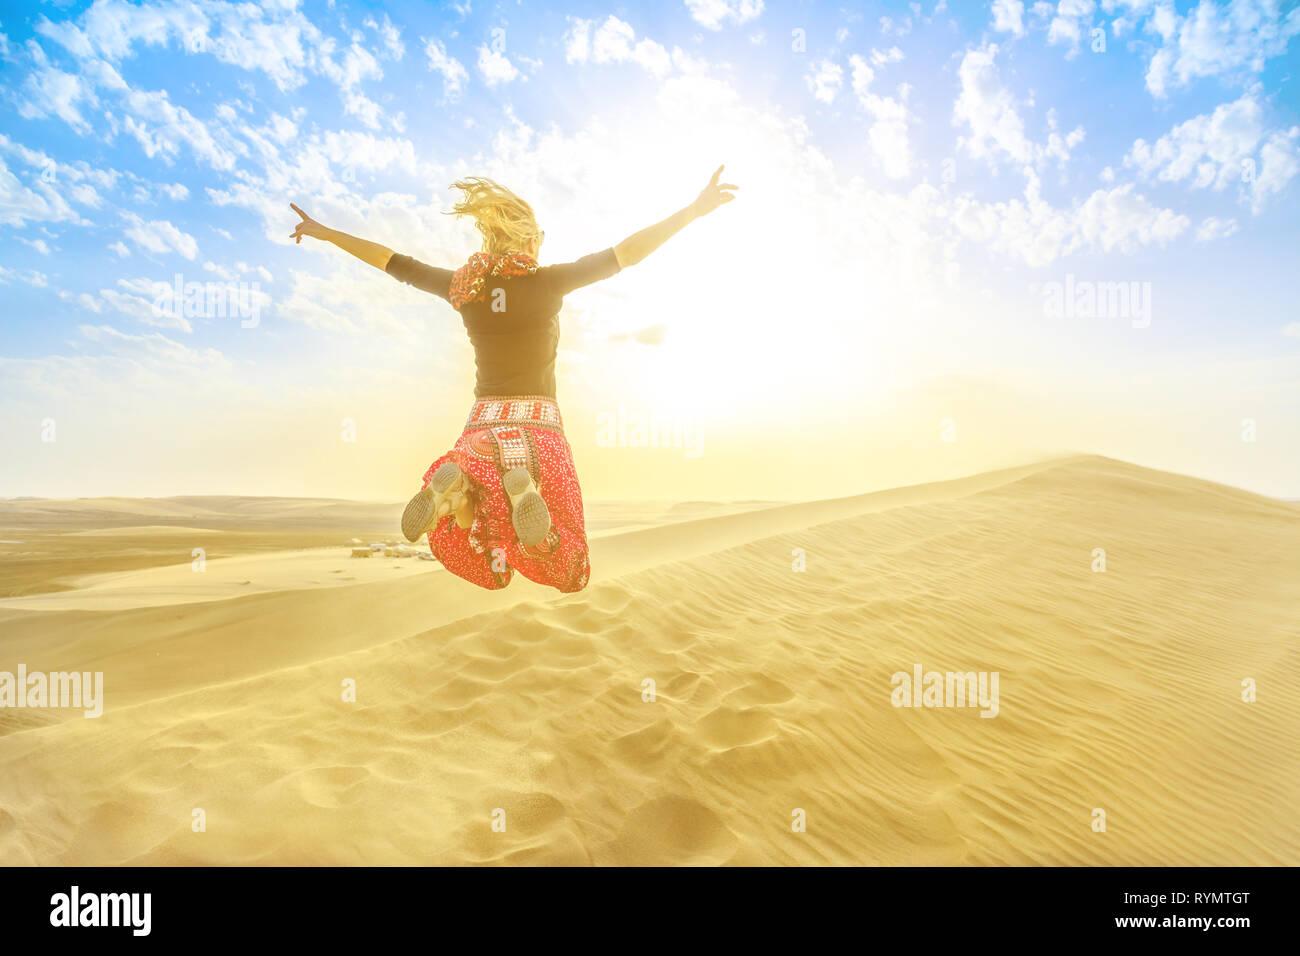 Inland sea landscape, a major tourist destination for Qatar. Woman traveler jumping on sand dunes in Qatar desert at sunset. Happy caucasian tourist - Stock Image